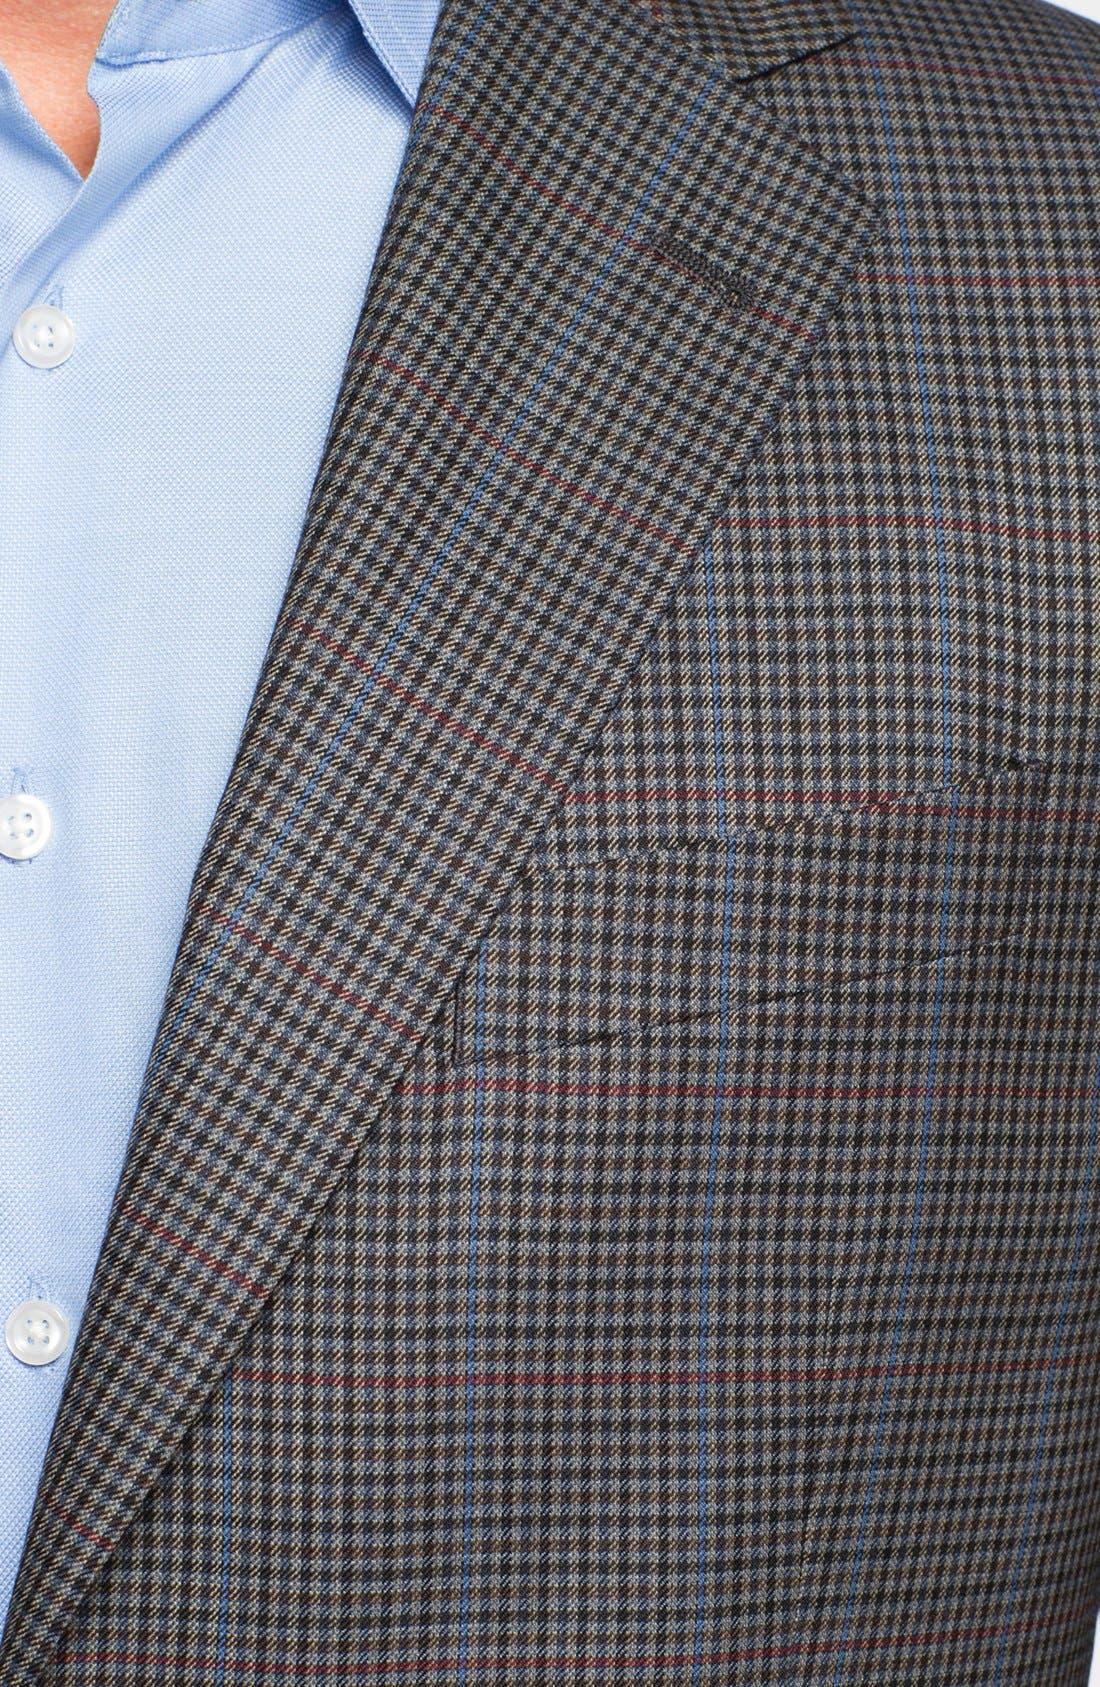 Alternate Image 2  - Joseph Abboud 'Signature Silver' Check Wool Sportcoat